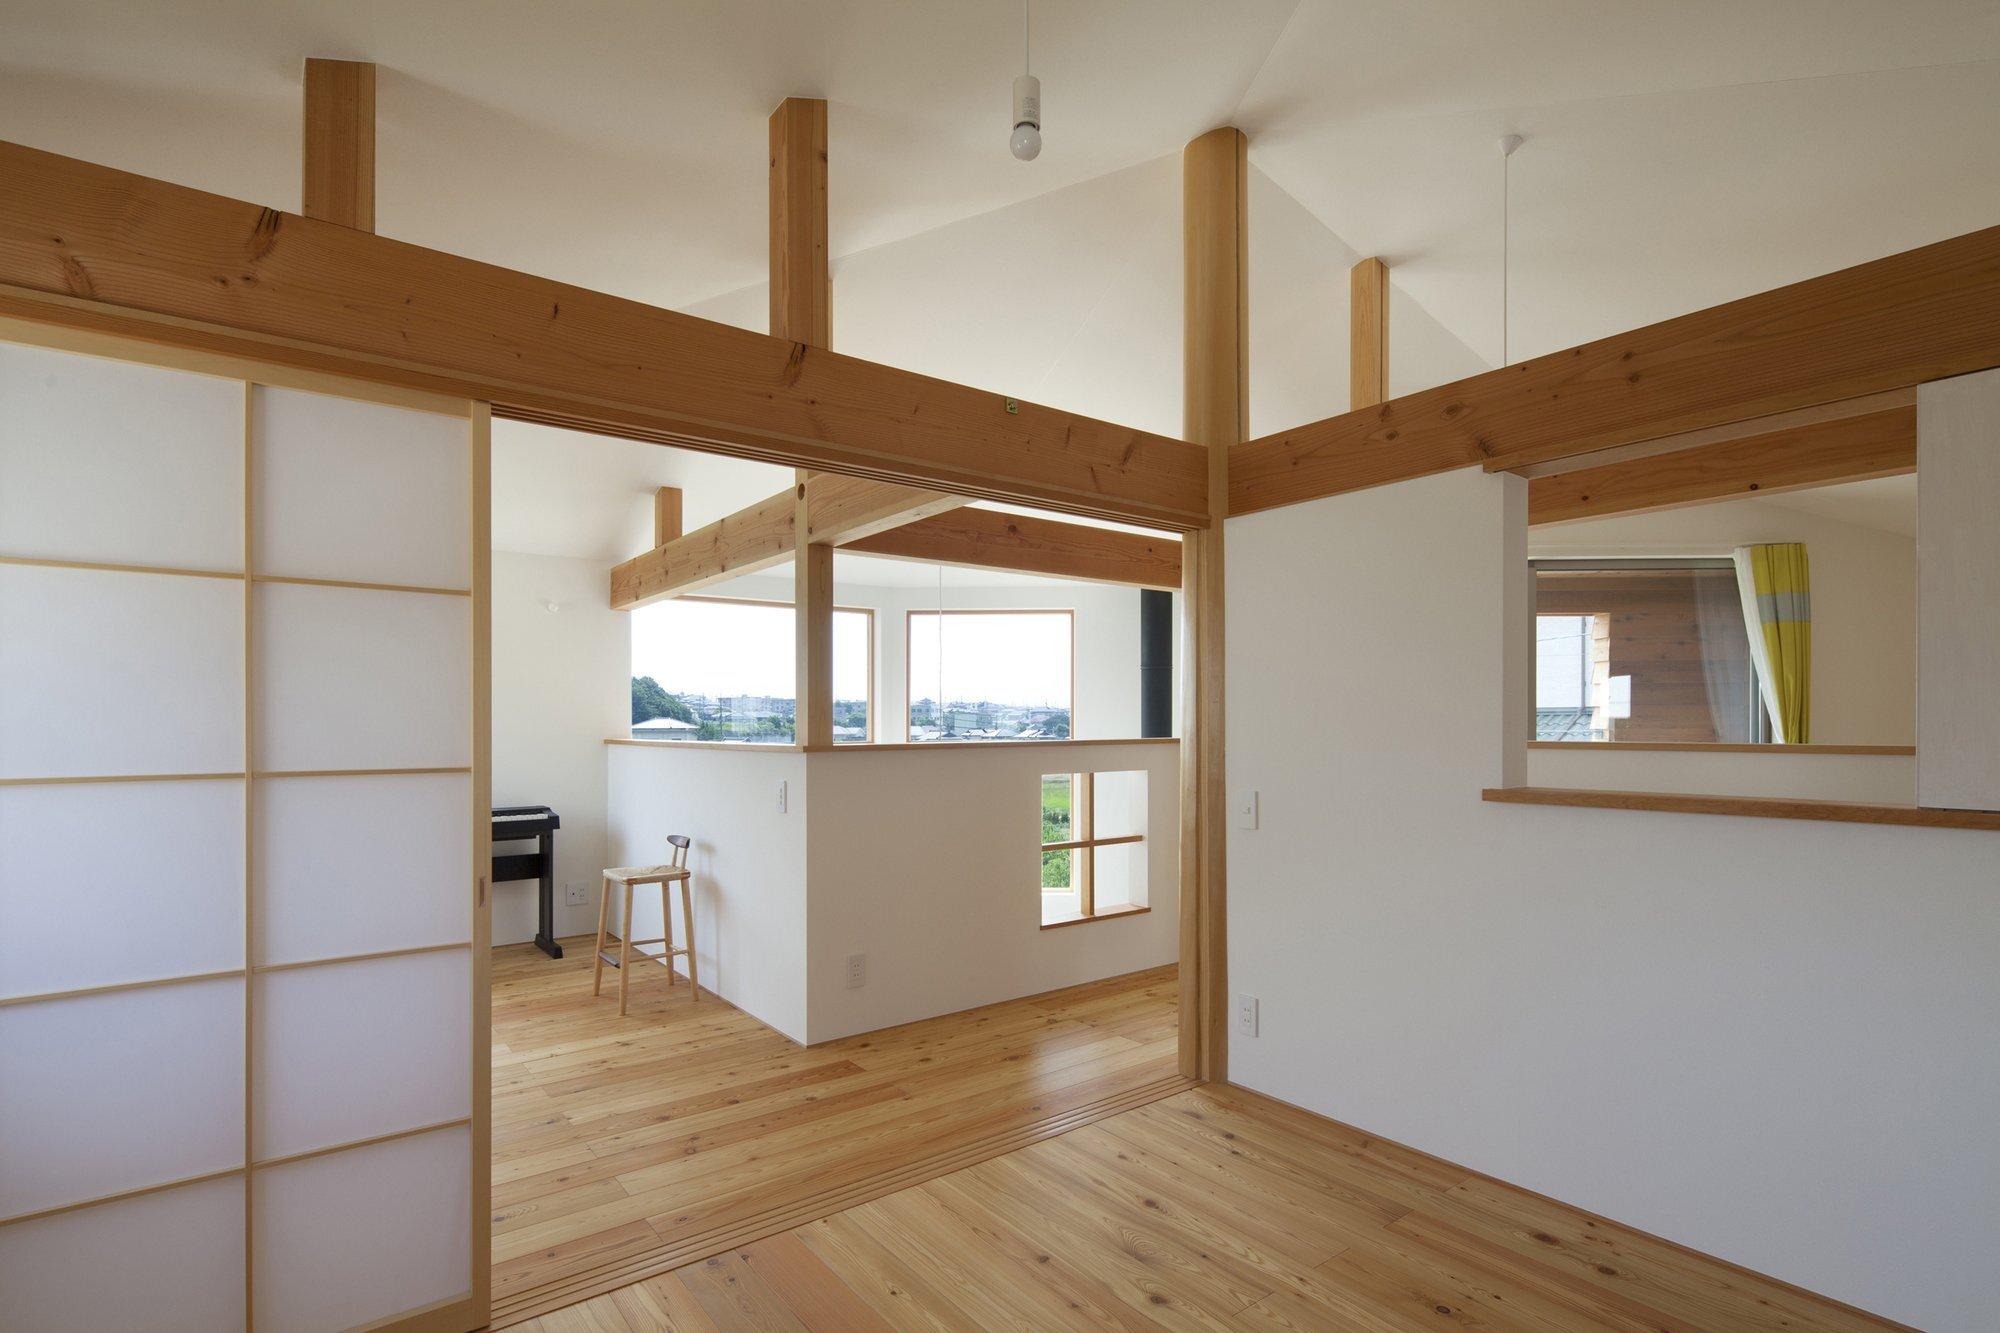 The Frontier House - Small Japanese House - Mamiya Shinichi Design Studio - Toyoake Japan - Bedroom - Humble Homes